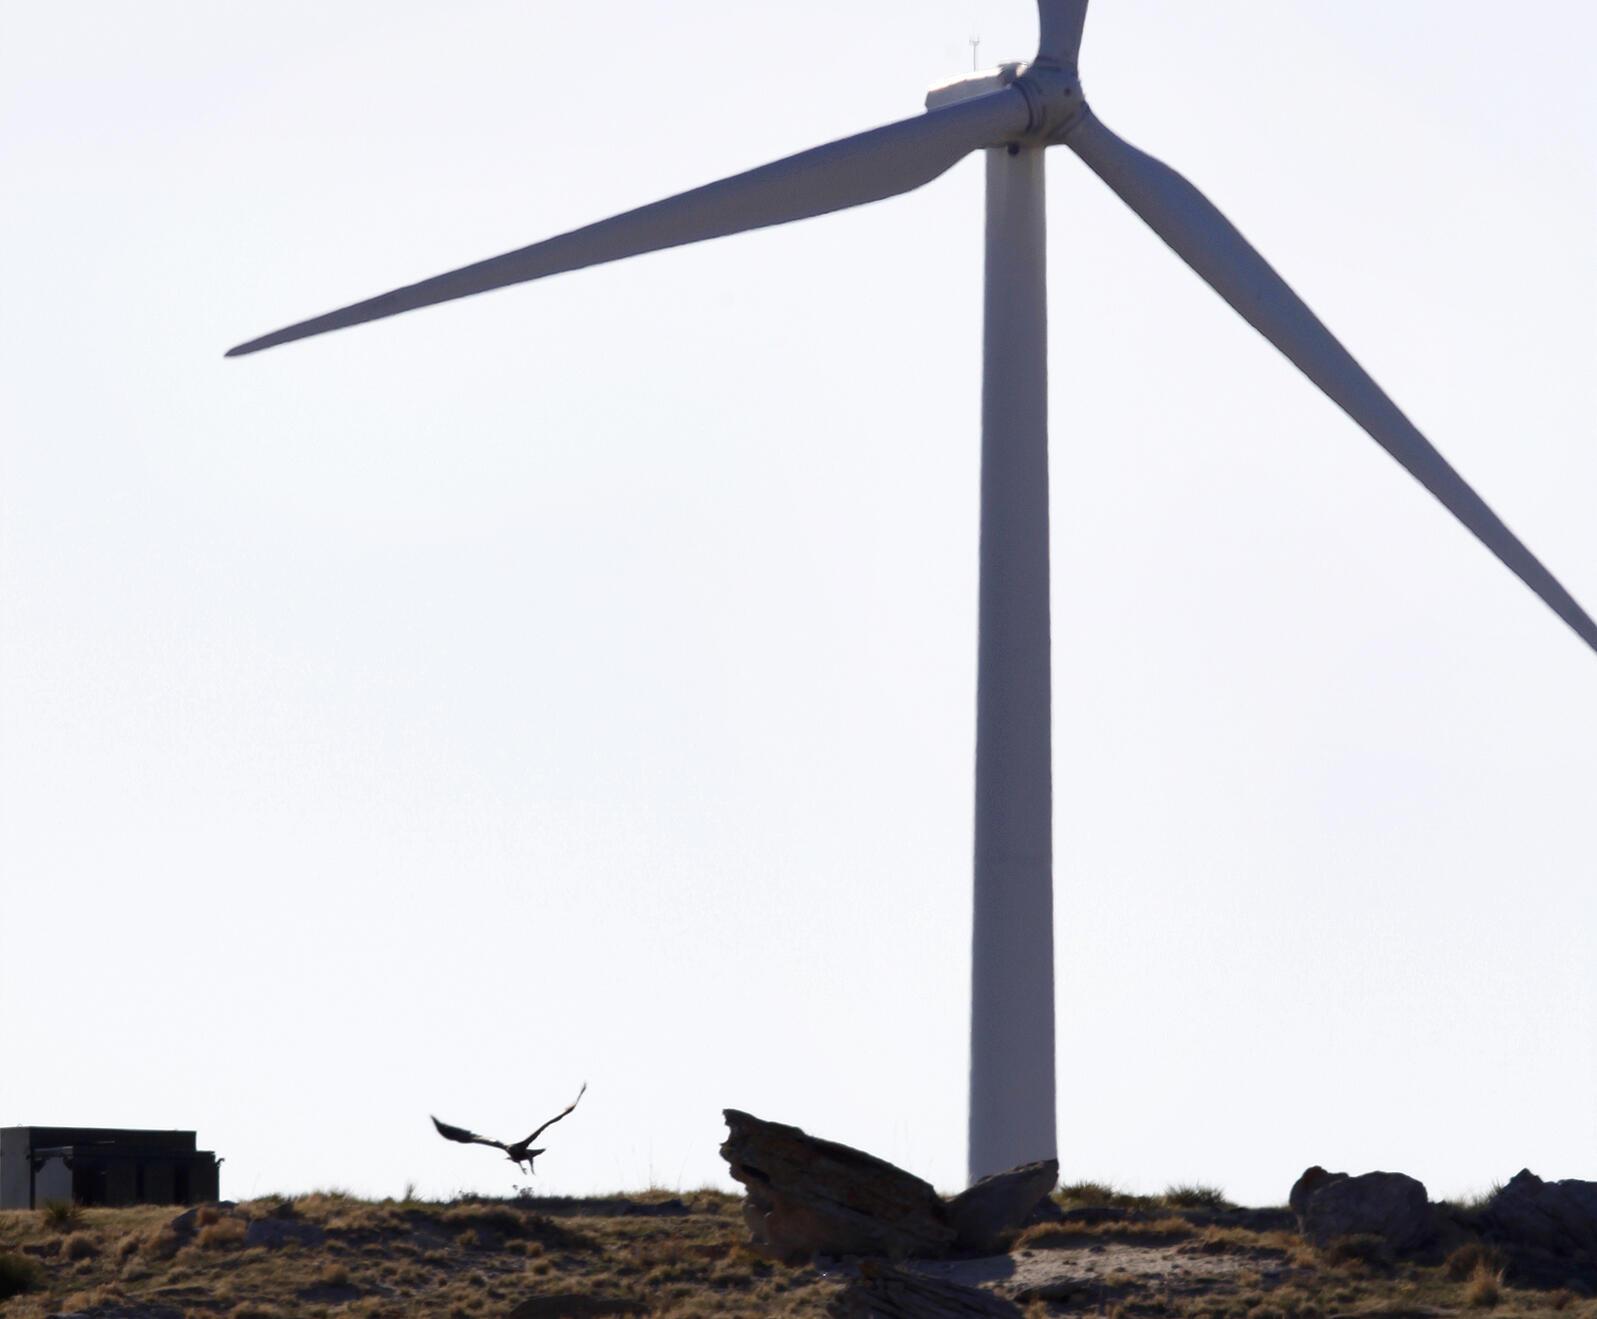 A golden eagle flies near a wind turbine in Wyoming. Matt Young/AP